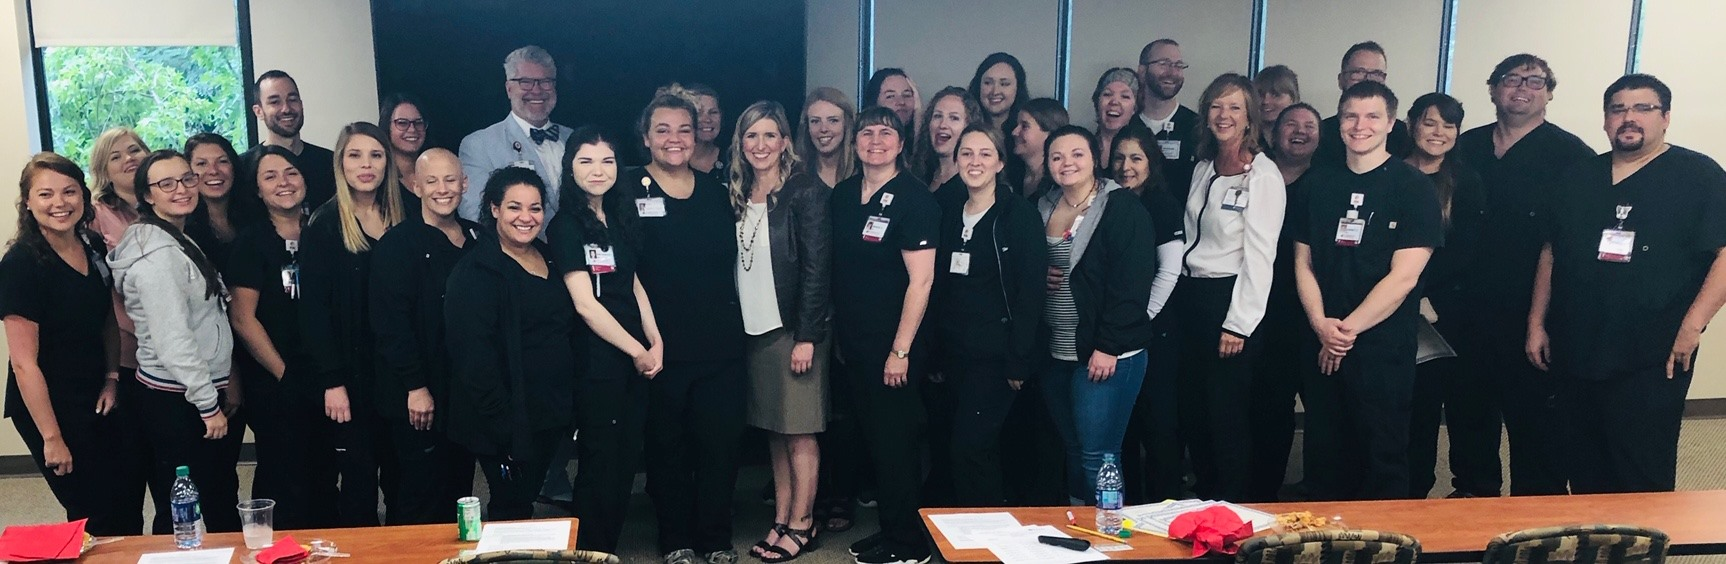 Parkwest Nurse Residency Grads 2019